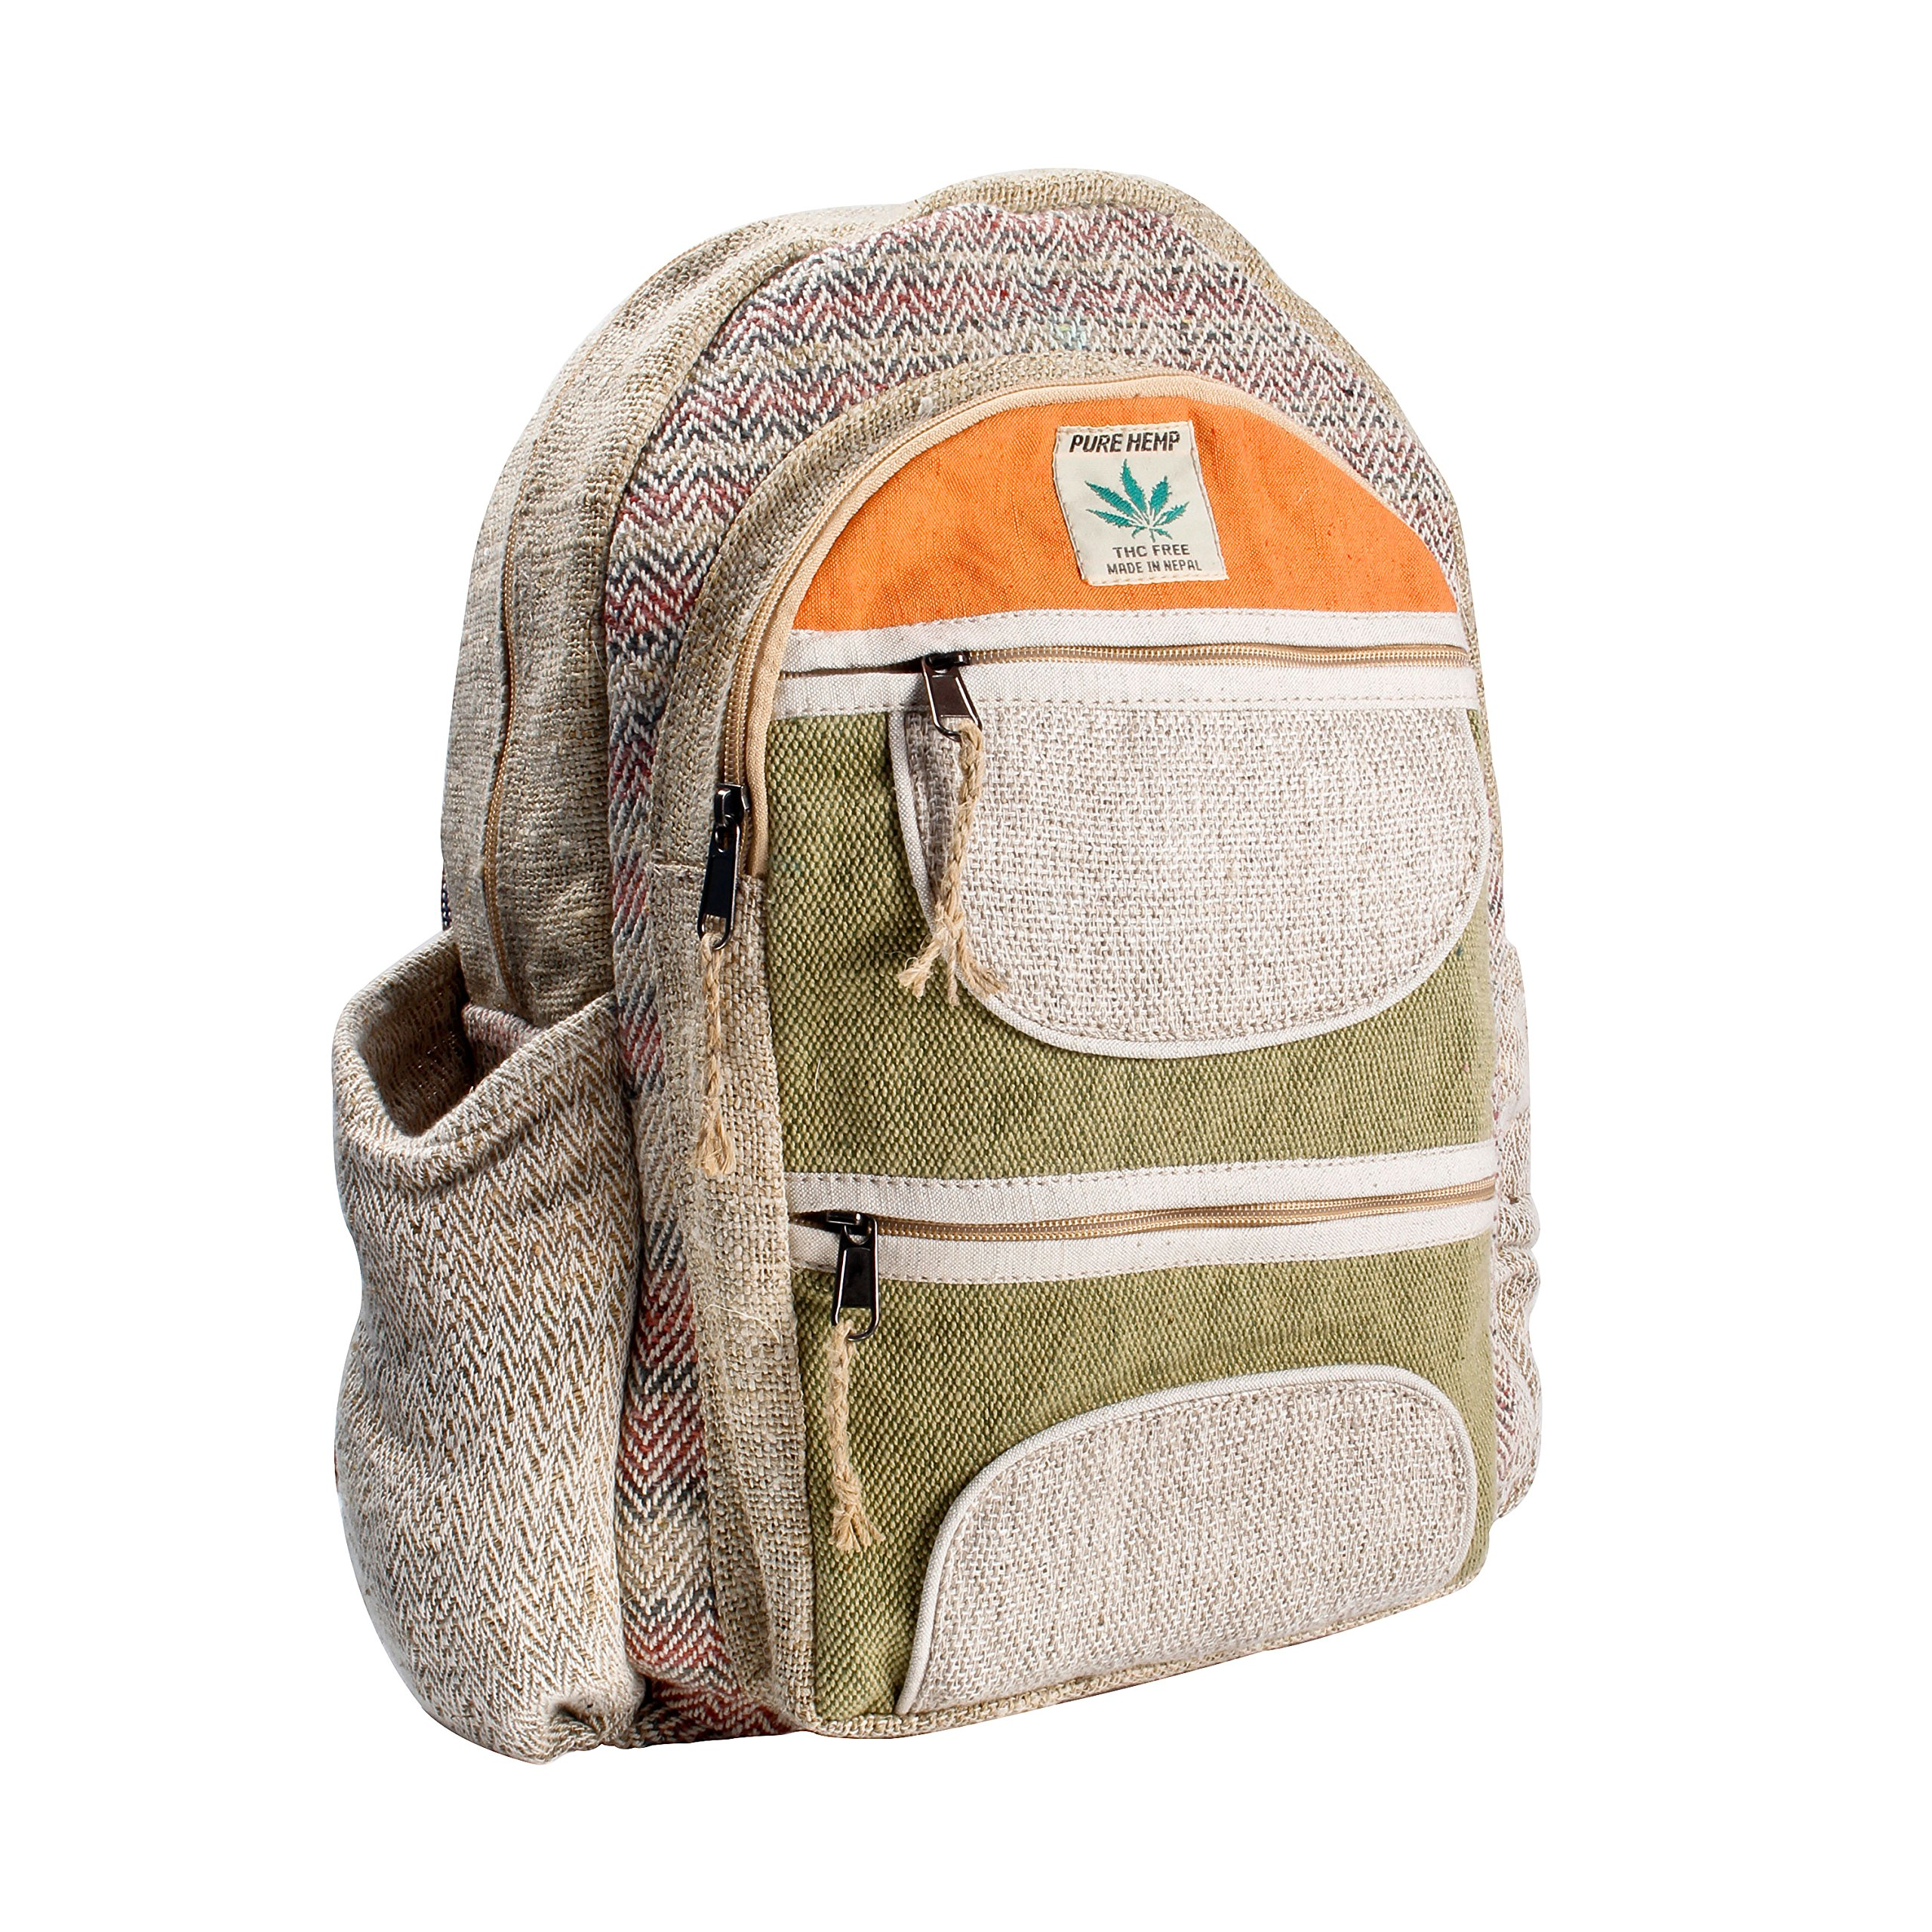 Maha Bodhi All Natural Handmade Multi Pocket Laptop Backpack - Himalayan Hemp by Maha Bodhi (Image #3)